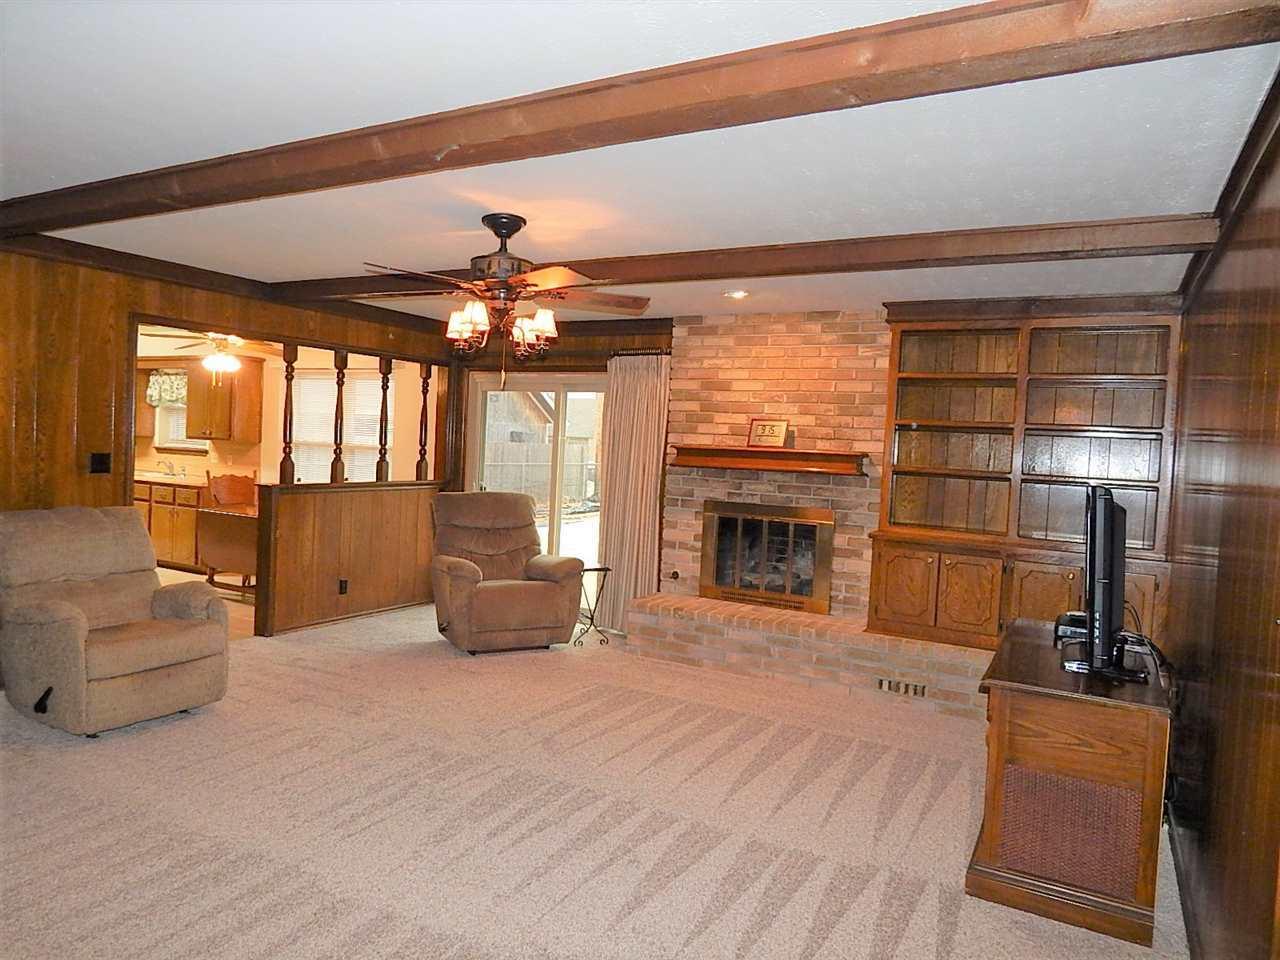 Sold Cross Sale W/ MLS | 2113 Berkshire  Ponca City, OK 74604 1